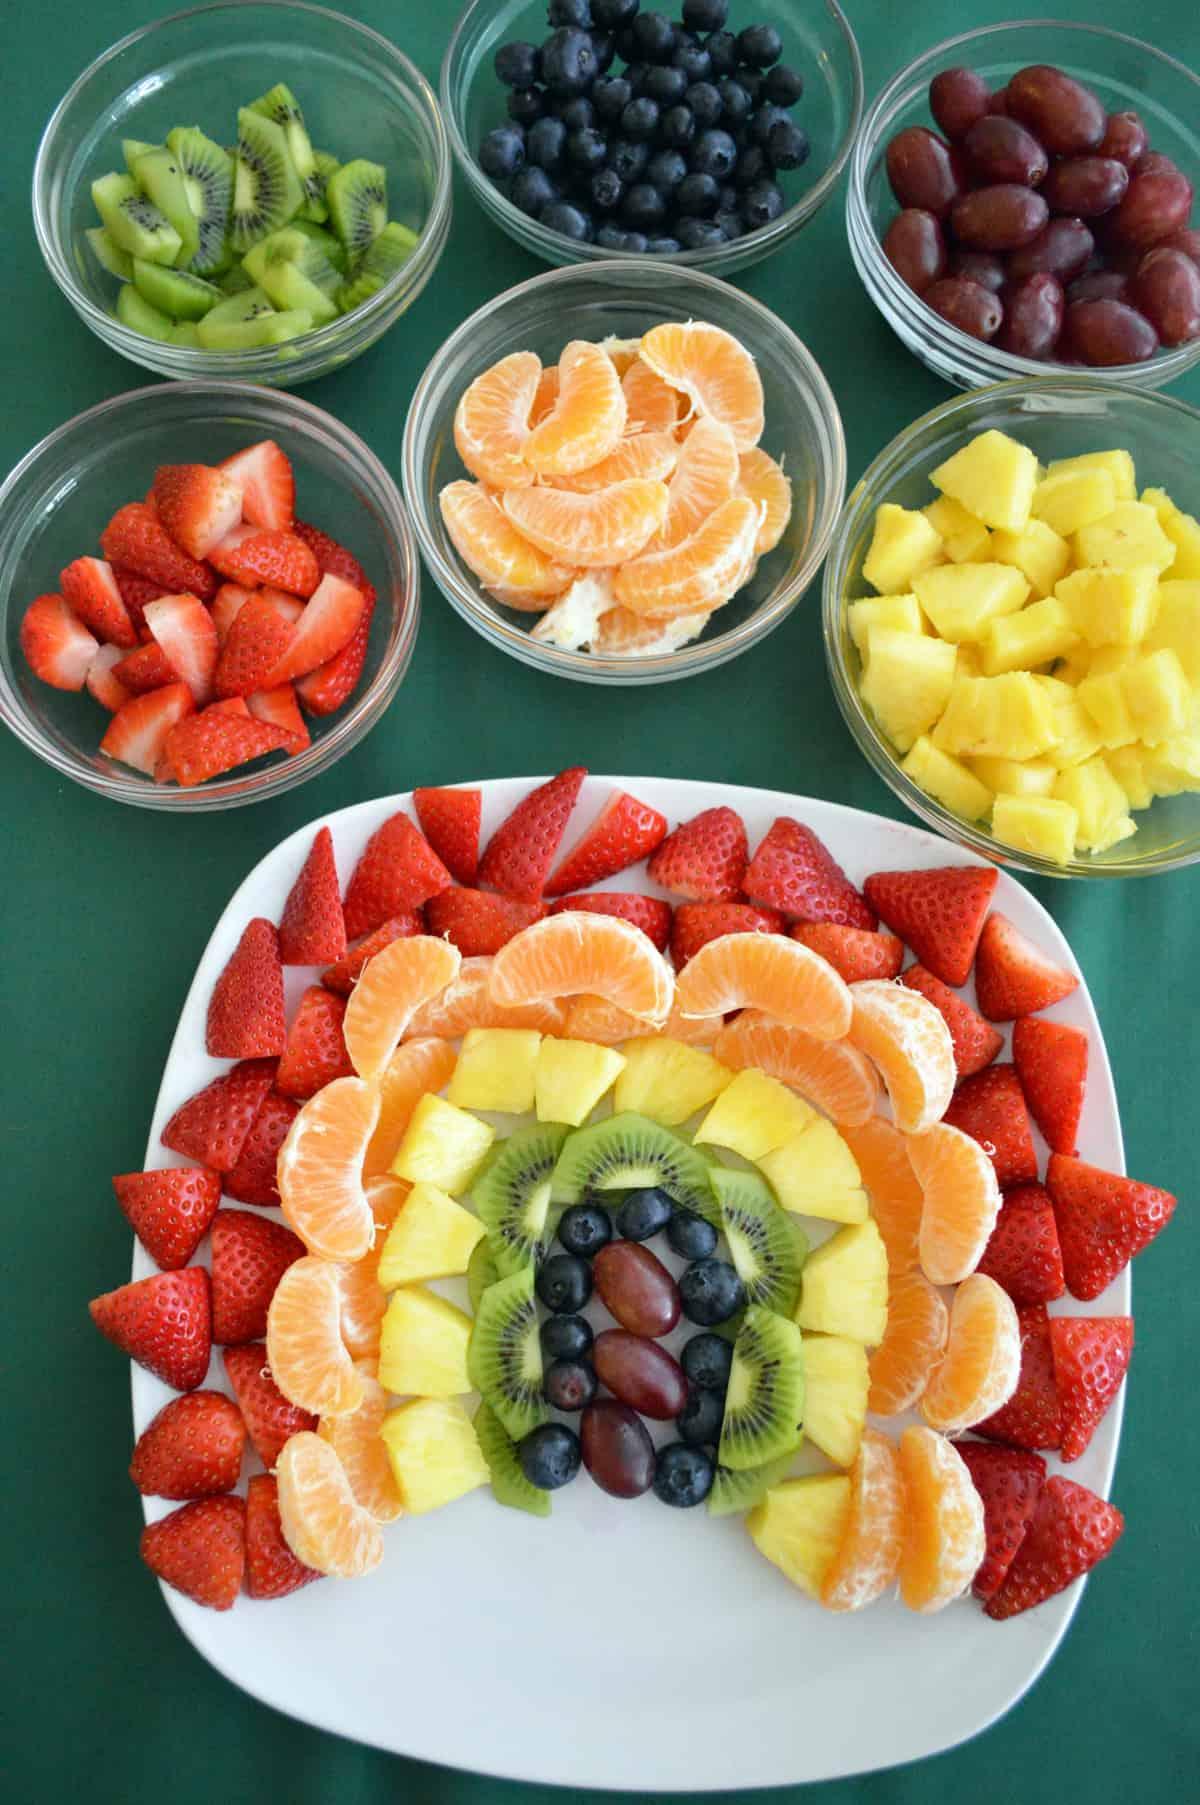 Rainbow Fruit Tray Produce For Kids